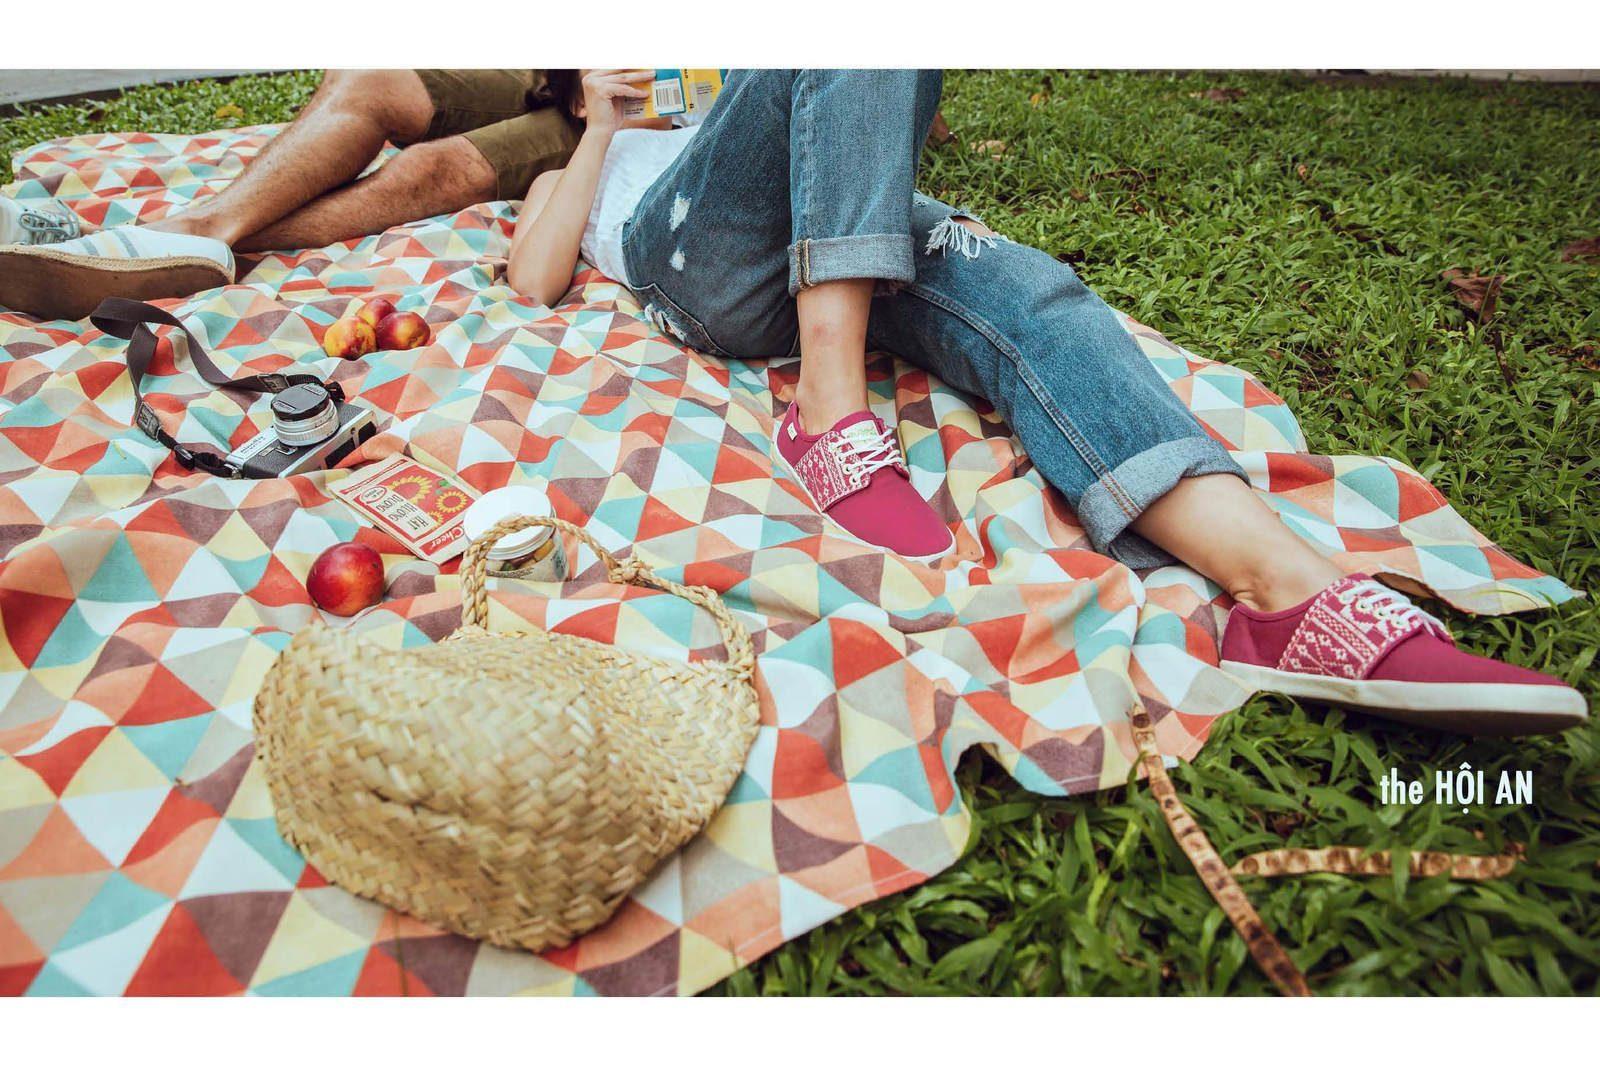 NGO Shoes - baskets - Vietnam - 15